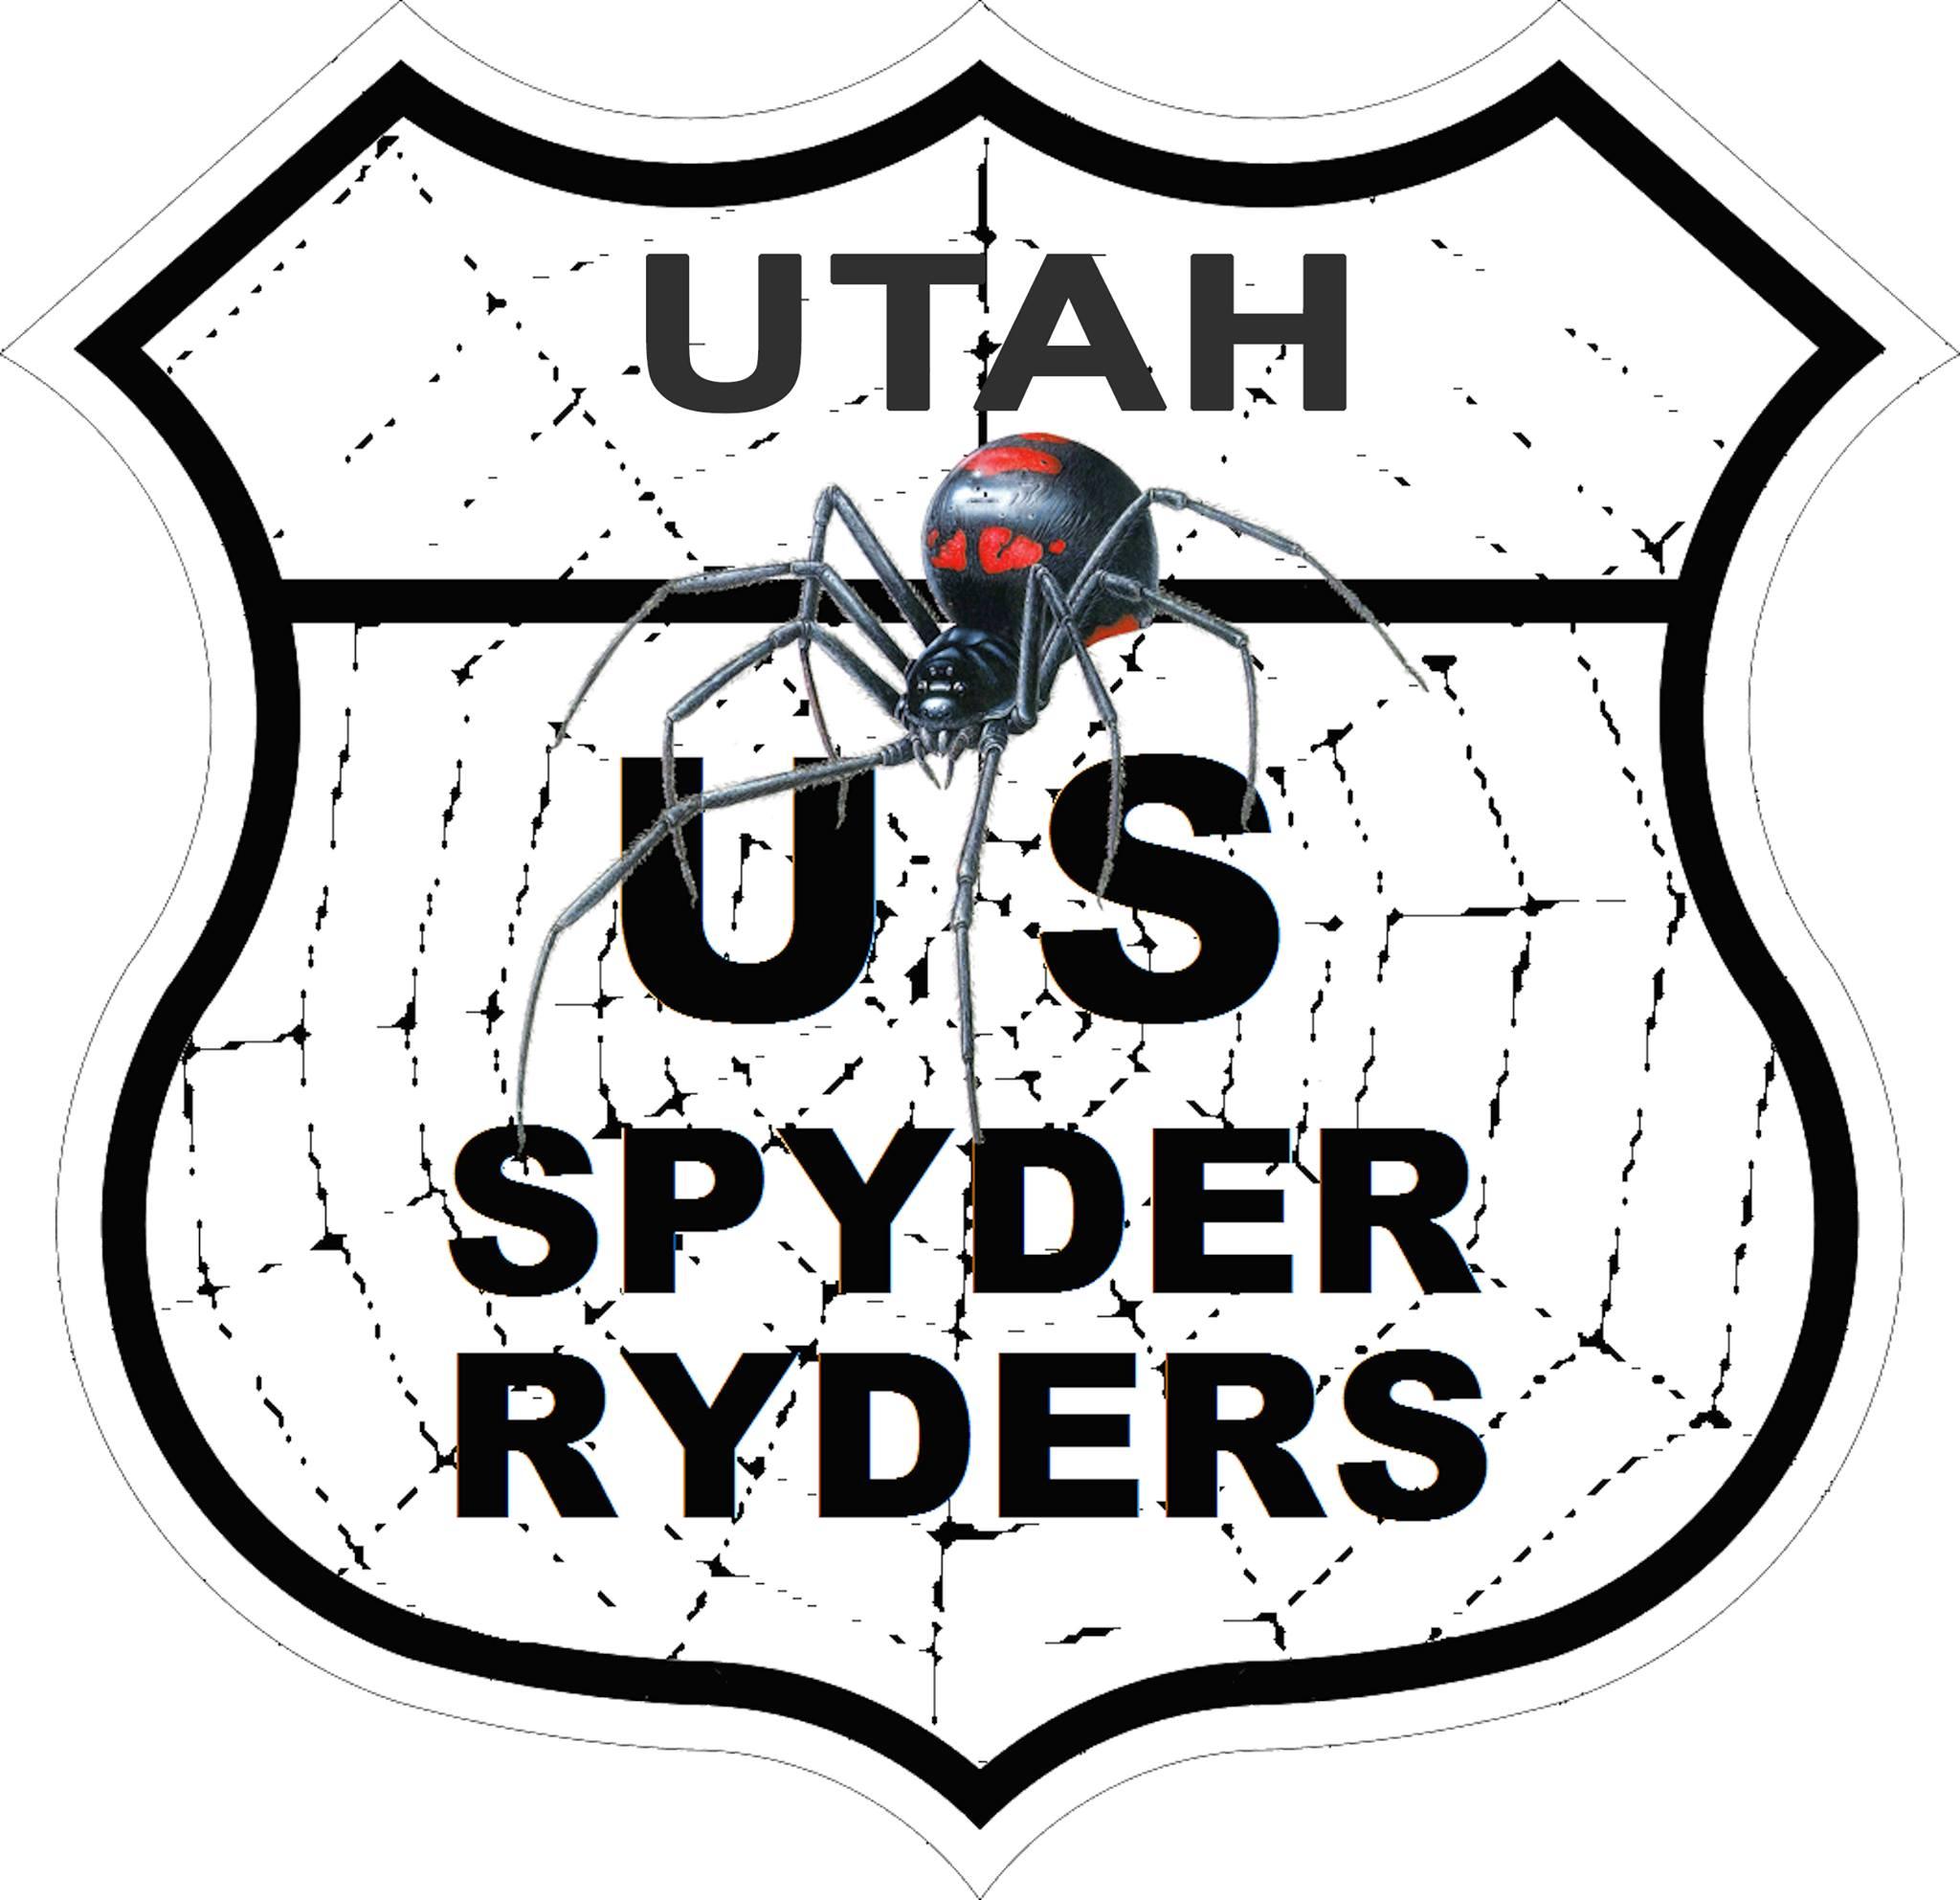 UT-Utah.jpg